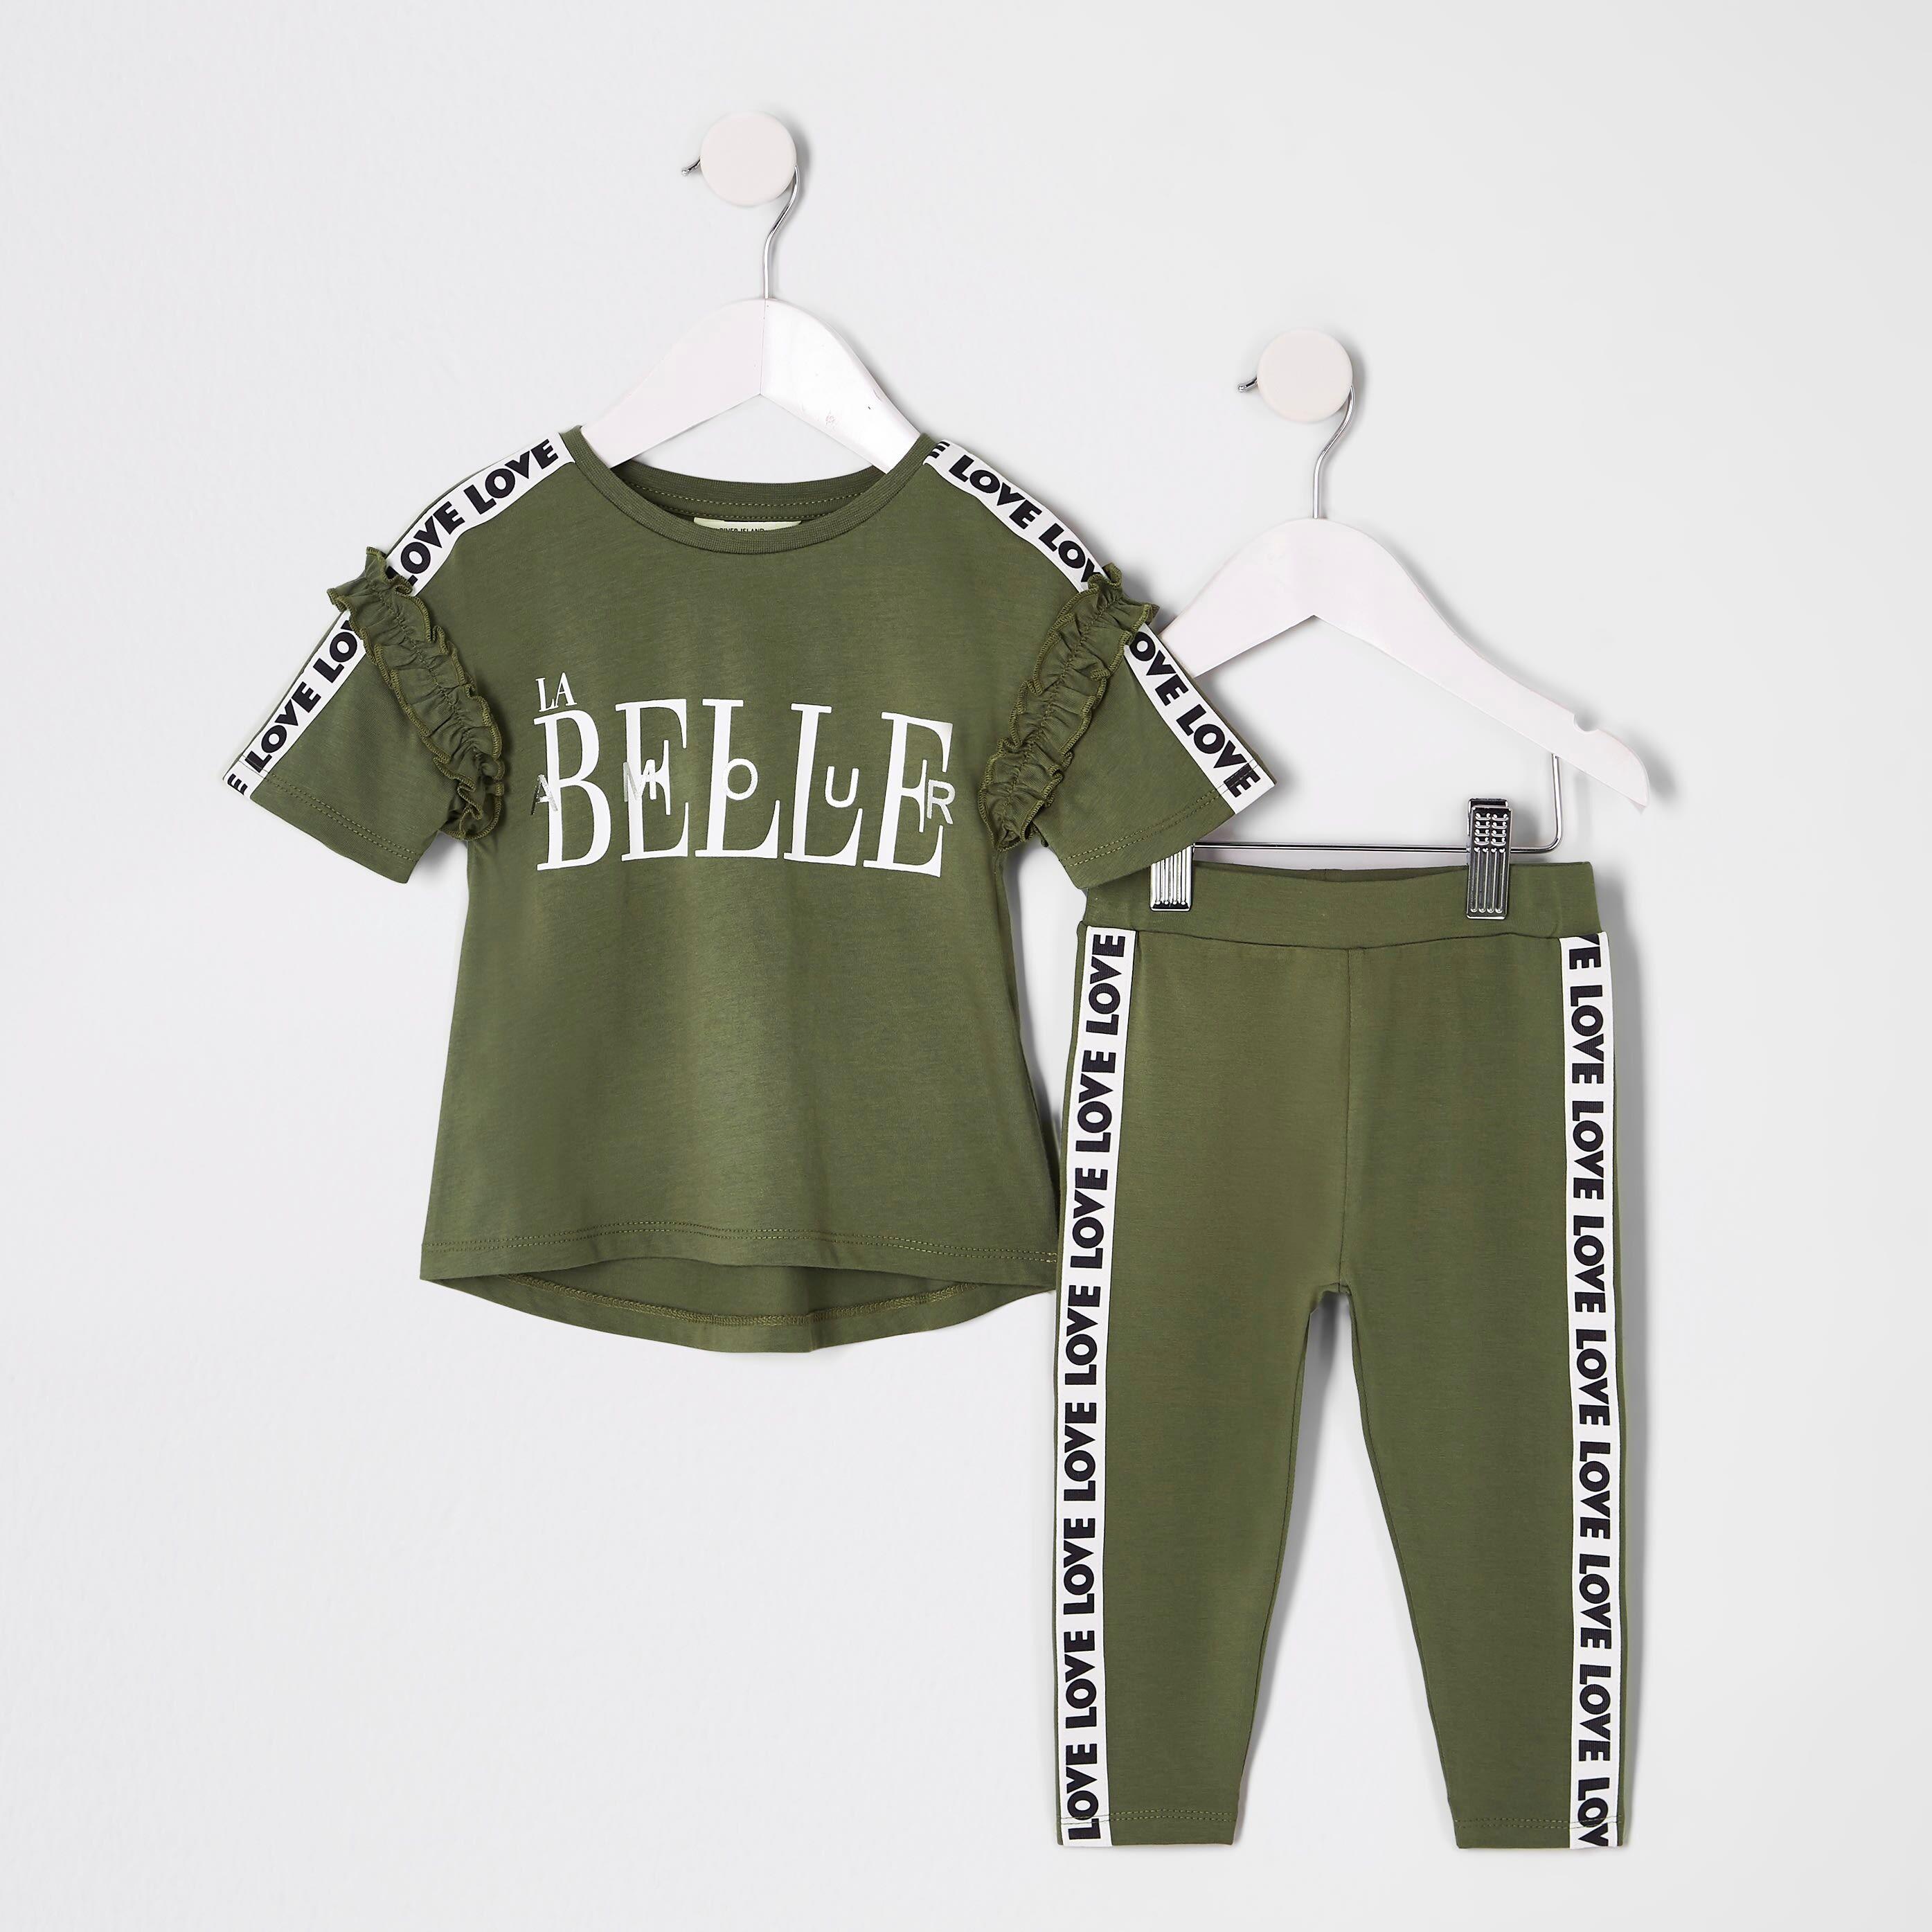 River Island Baby Girls Khaki 'La belle' T-shirt outfit (9-12 Mths)